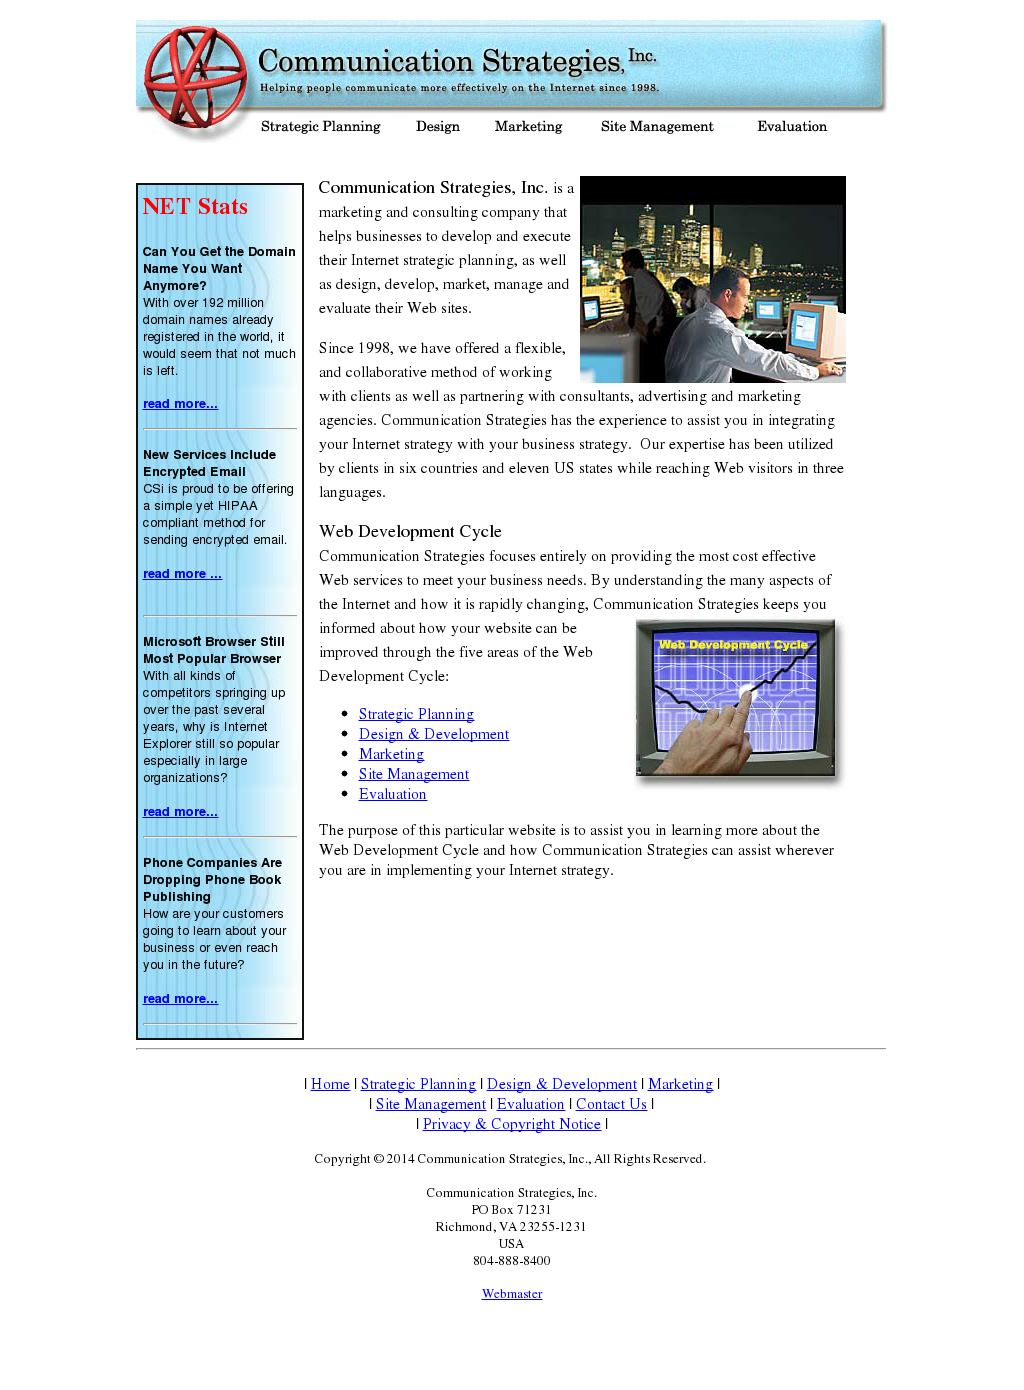 evaluating communication strategies